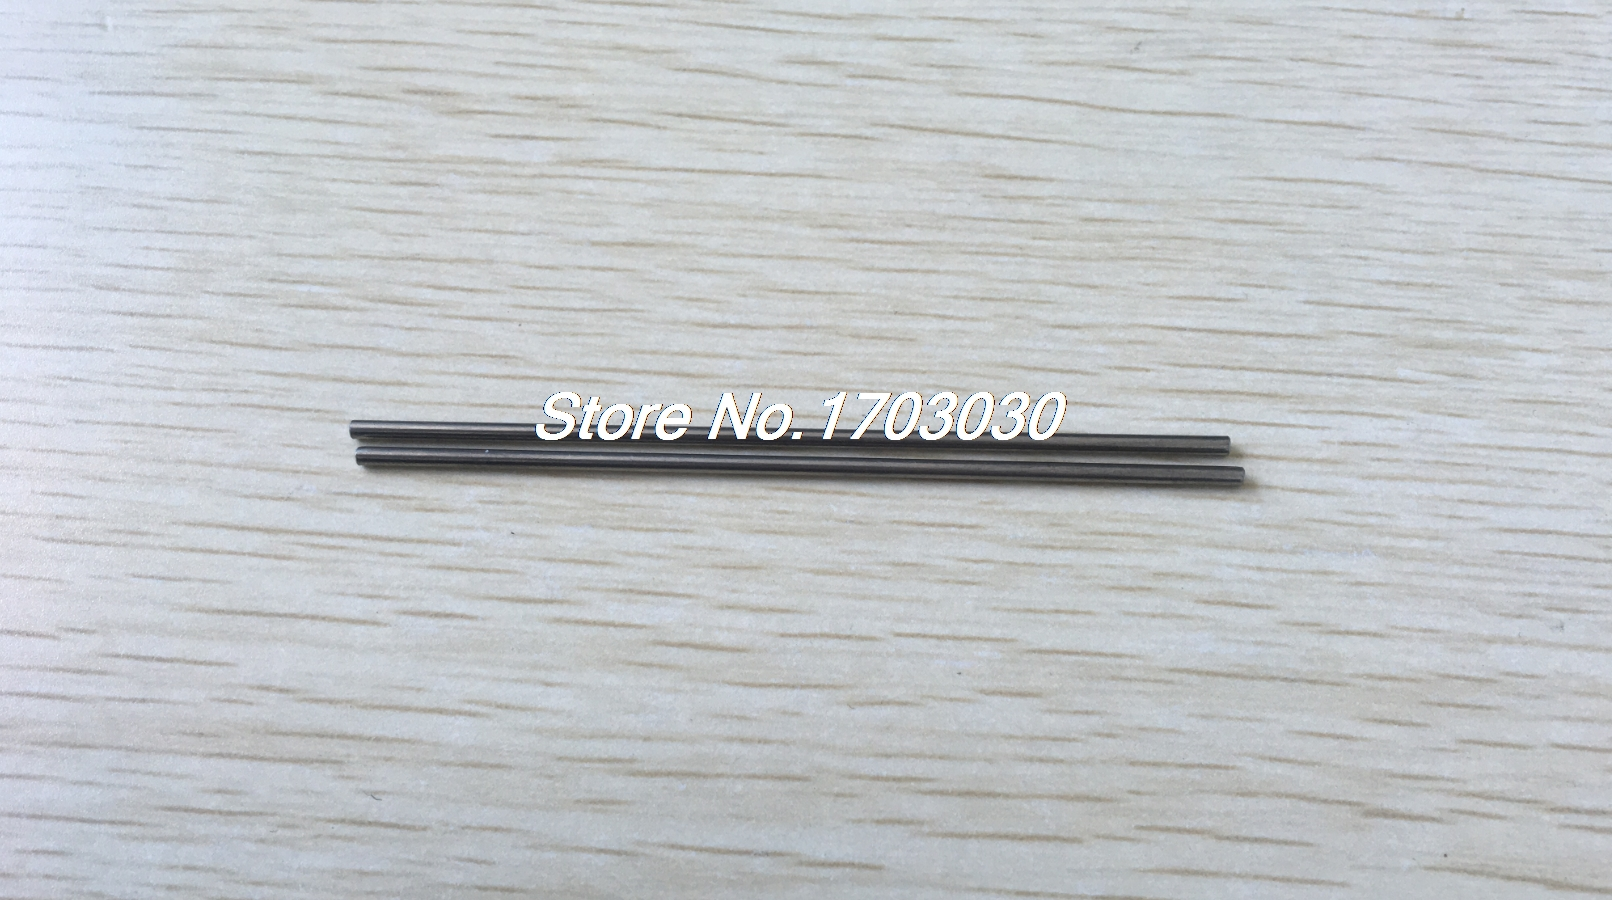 15 Pcs Car Model Toy DIY Stainless Steel Axles Rod Bars 3mm x 80mm